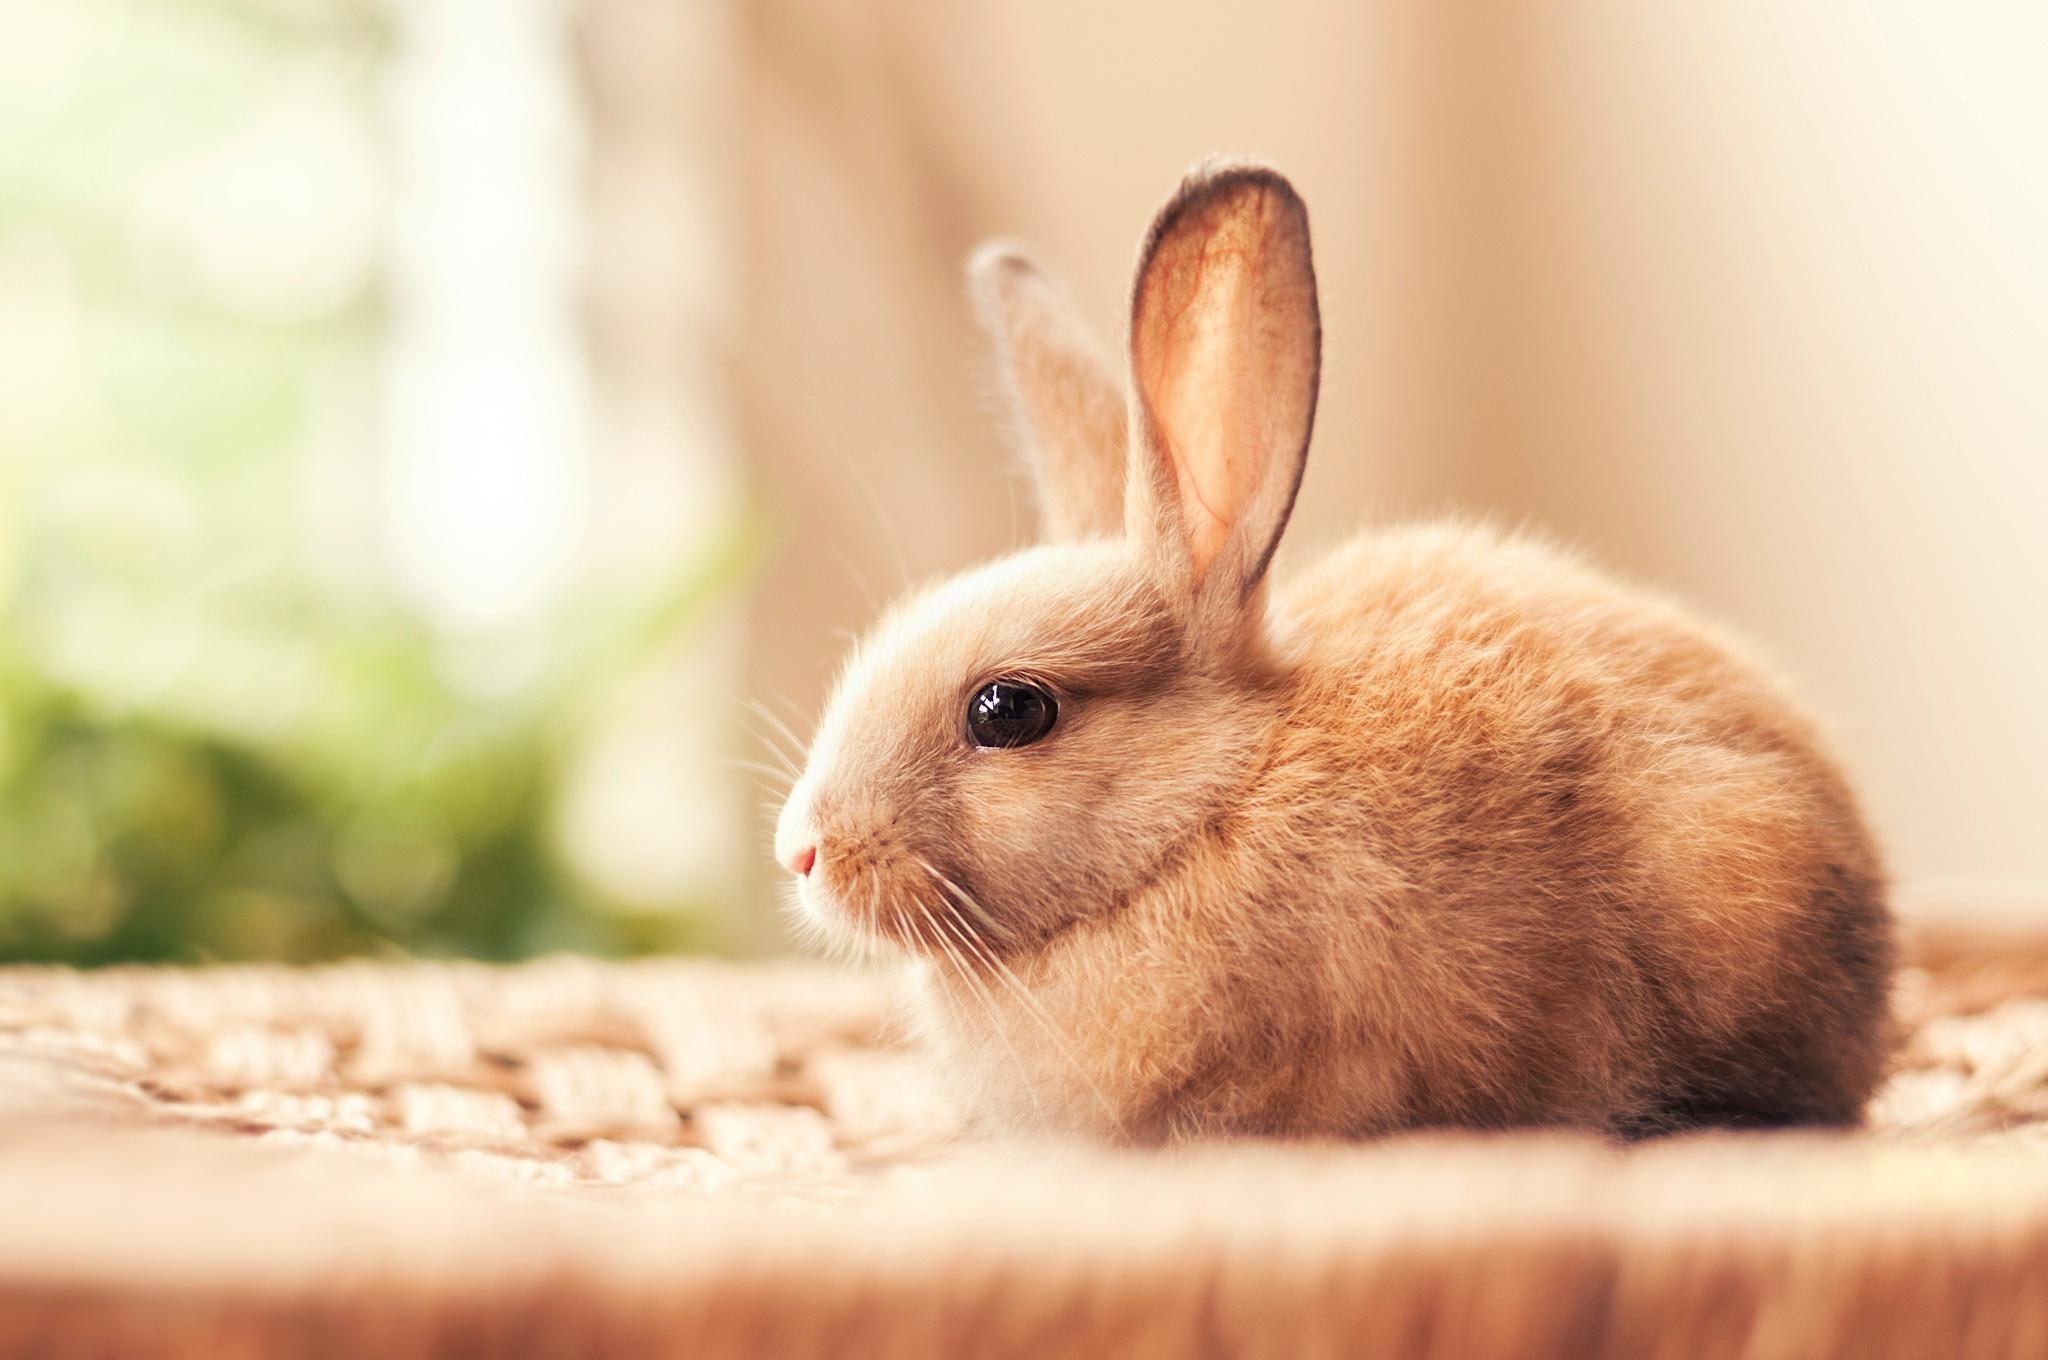 Описание кролика | Мой Тамагочи